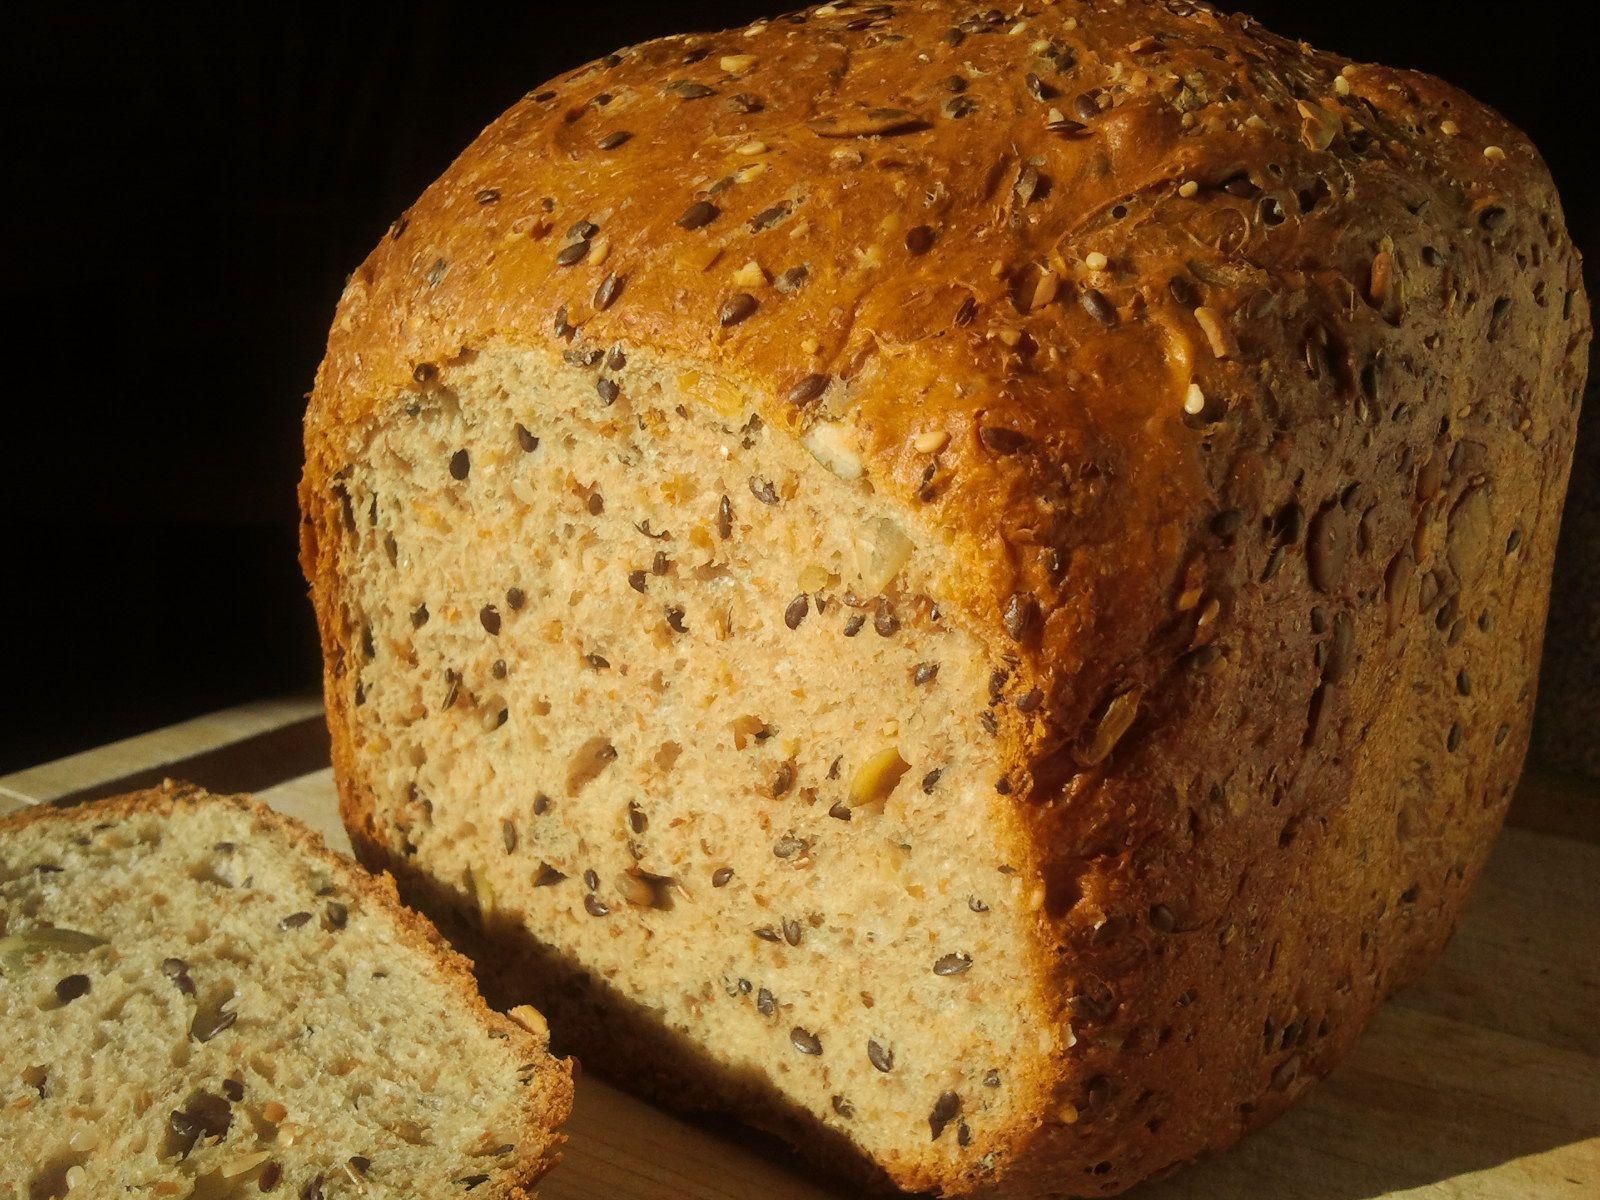 Atkins Low Carb Bread  Food of Love BEST Low Carb Bread No joke